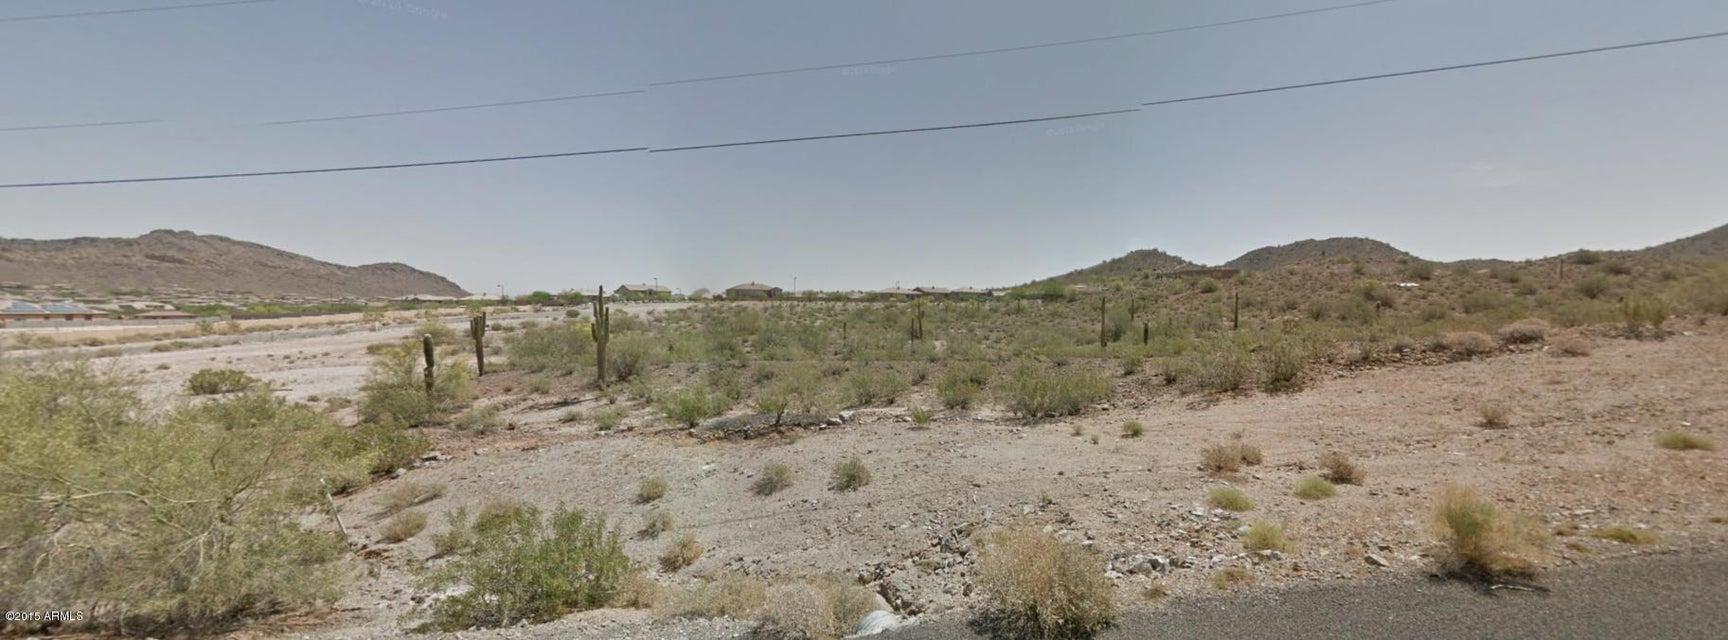 26431 N 92 Avenue Lot 1, Peoria, AZ 85383